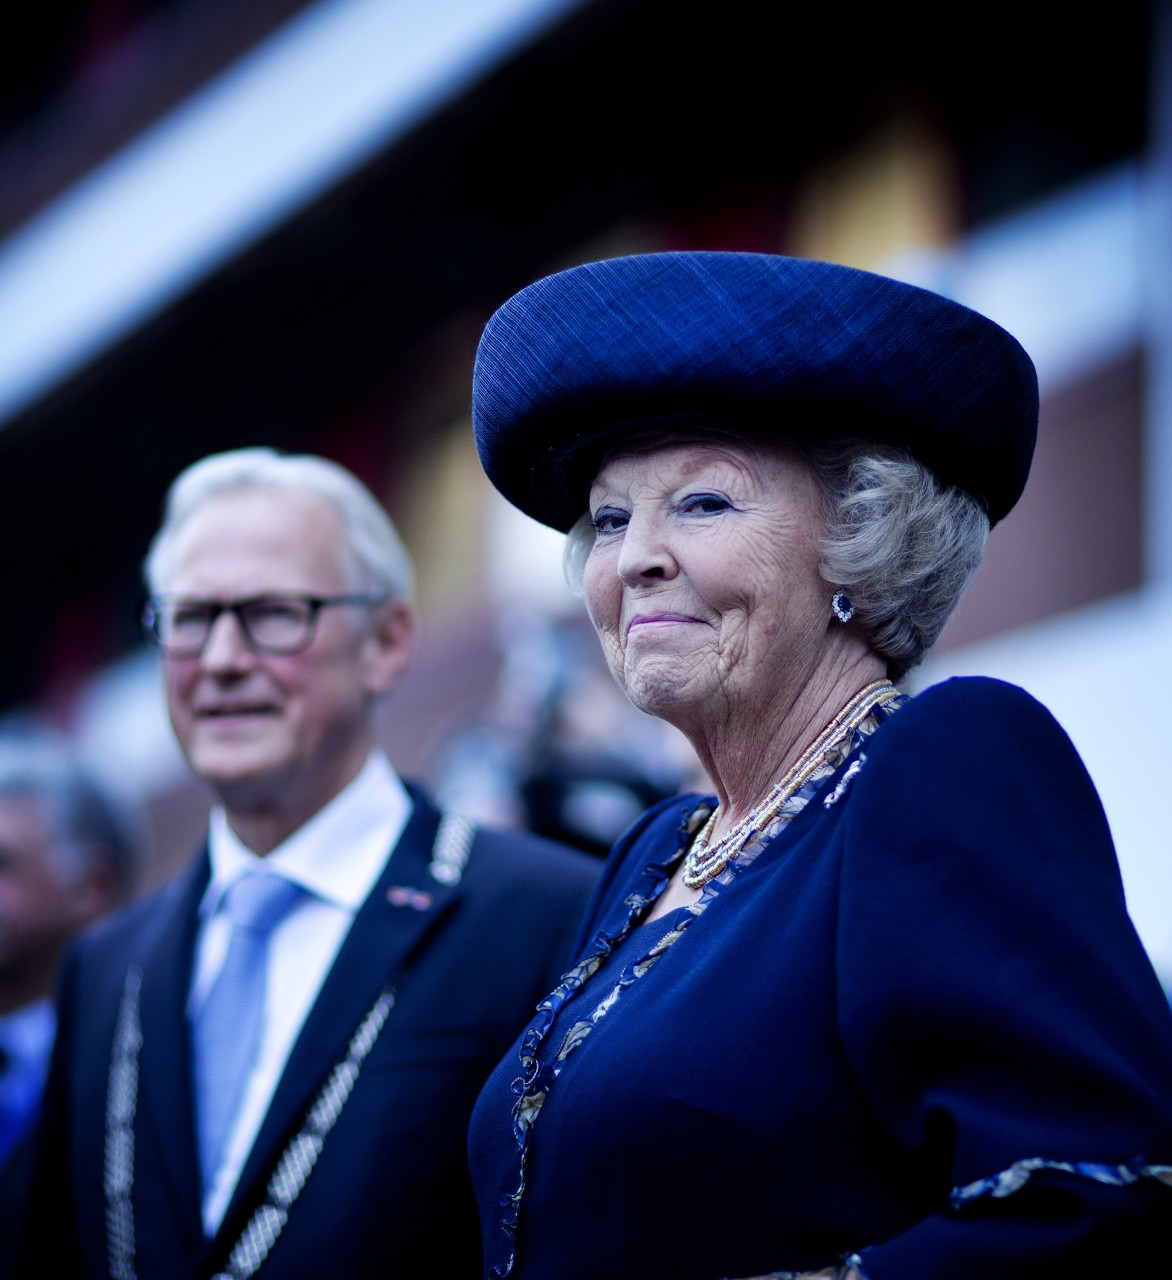 Koningin Beatrix en Italiaanse president Napolitano bij ESTEC No